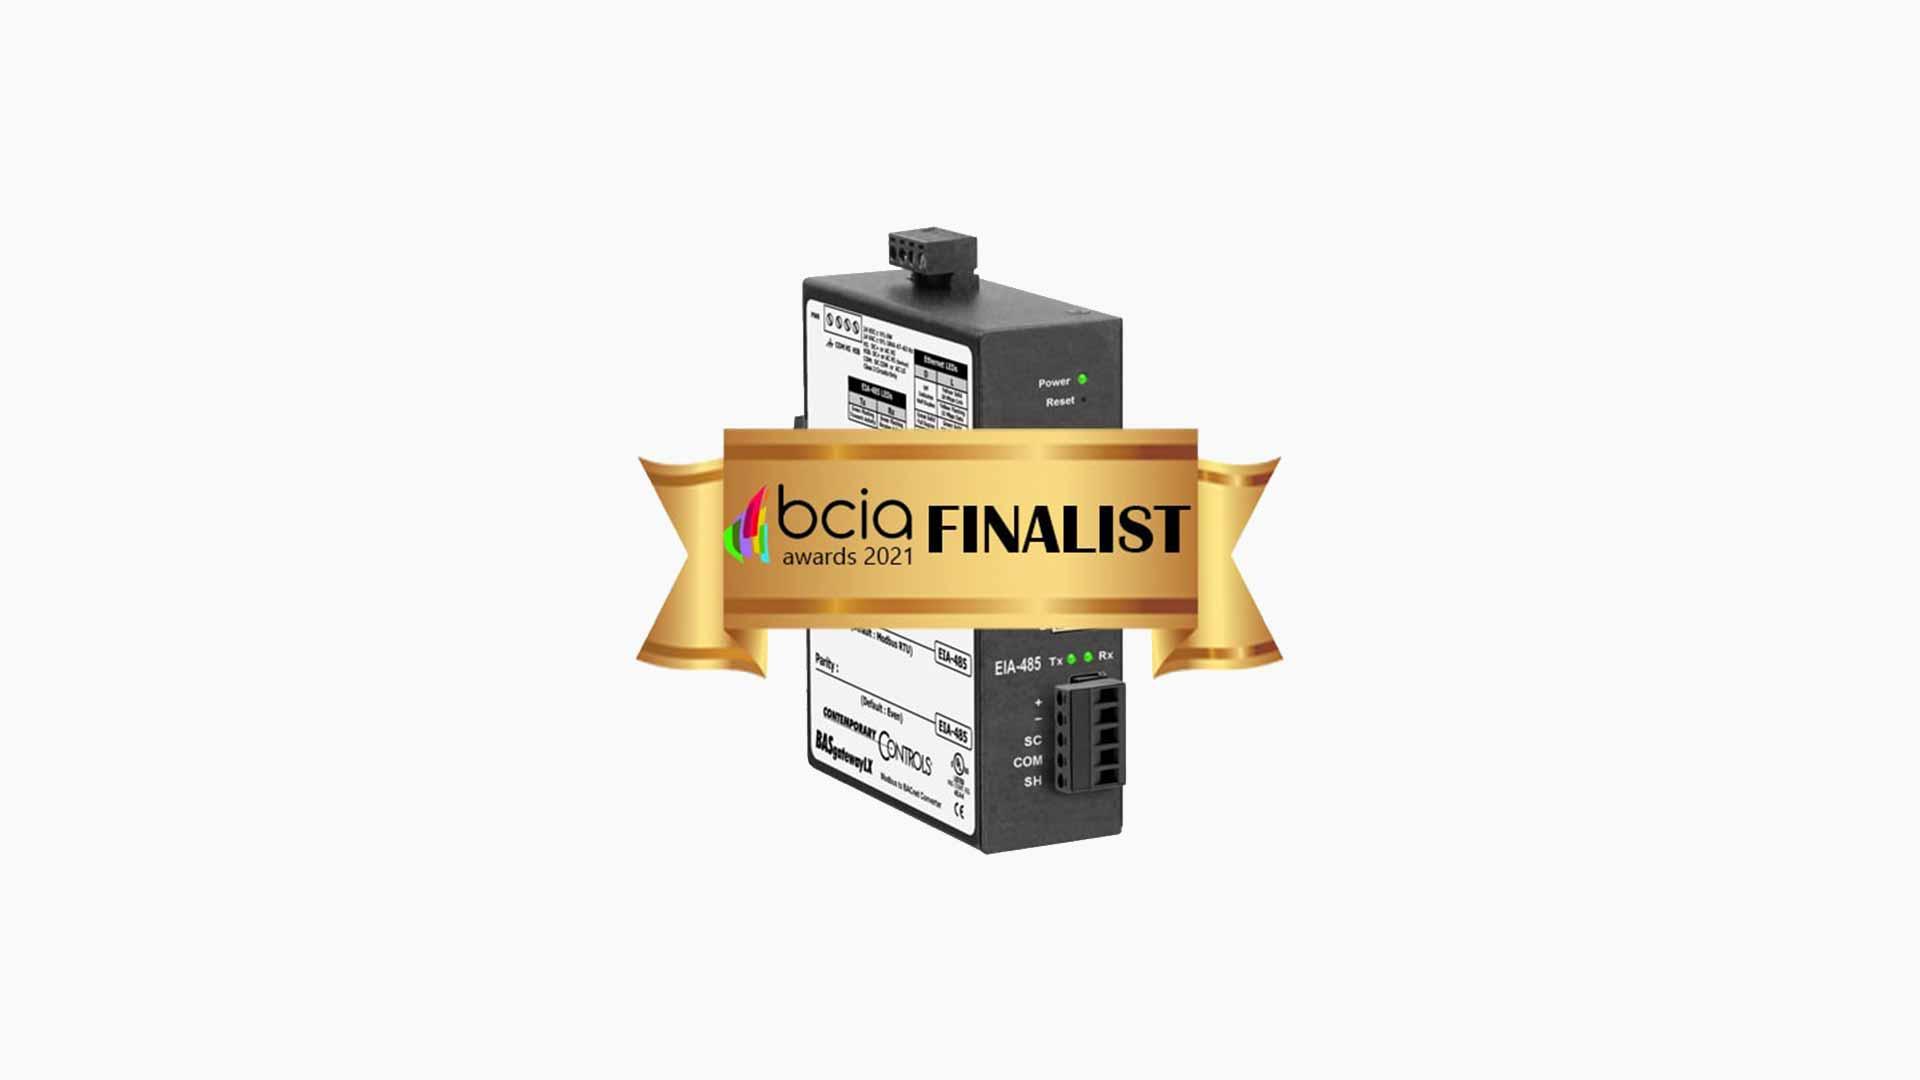 Feature Image BASgatewayLX ontvangt erkenning voor innovatie